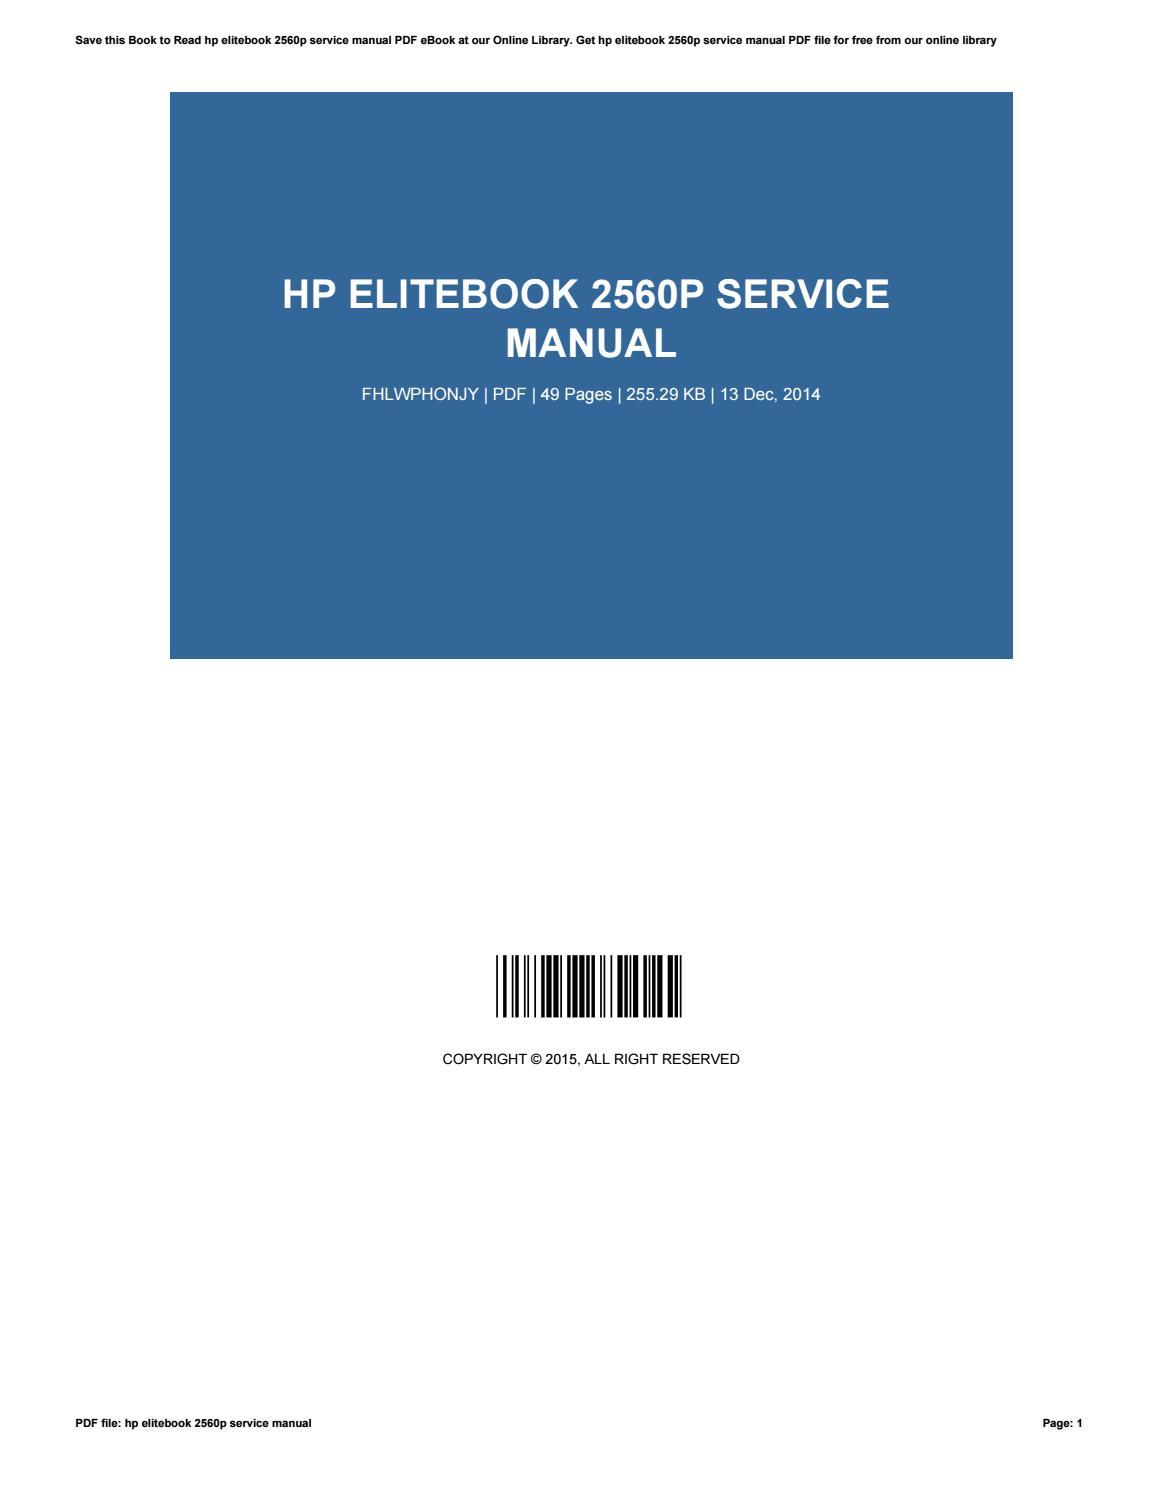 hp elitebook 8440p service manual